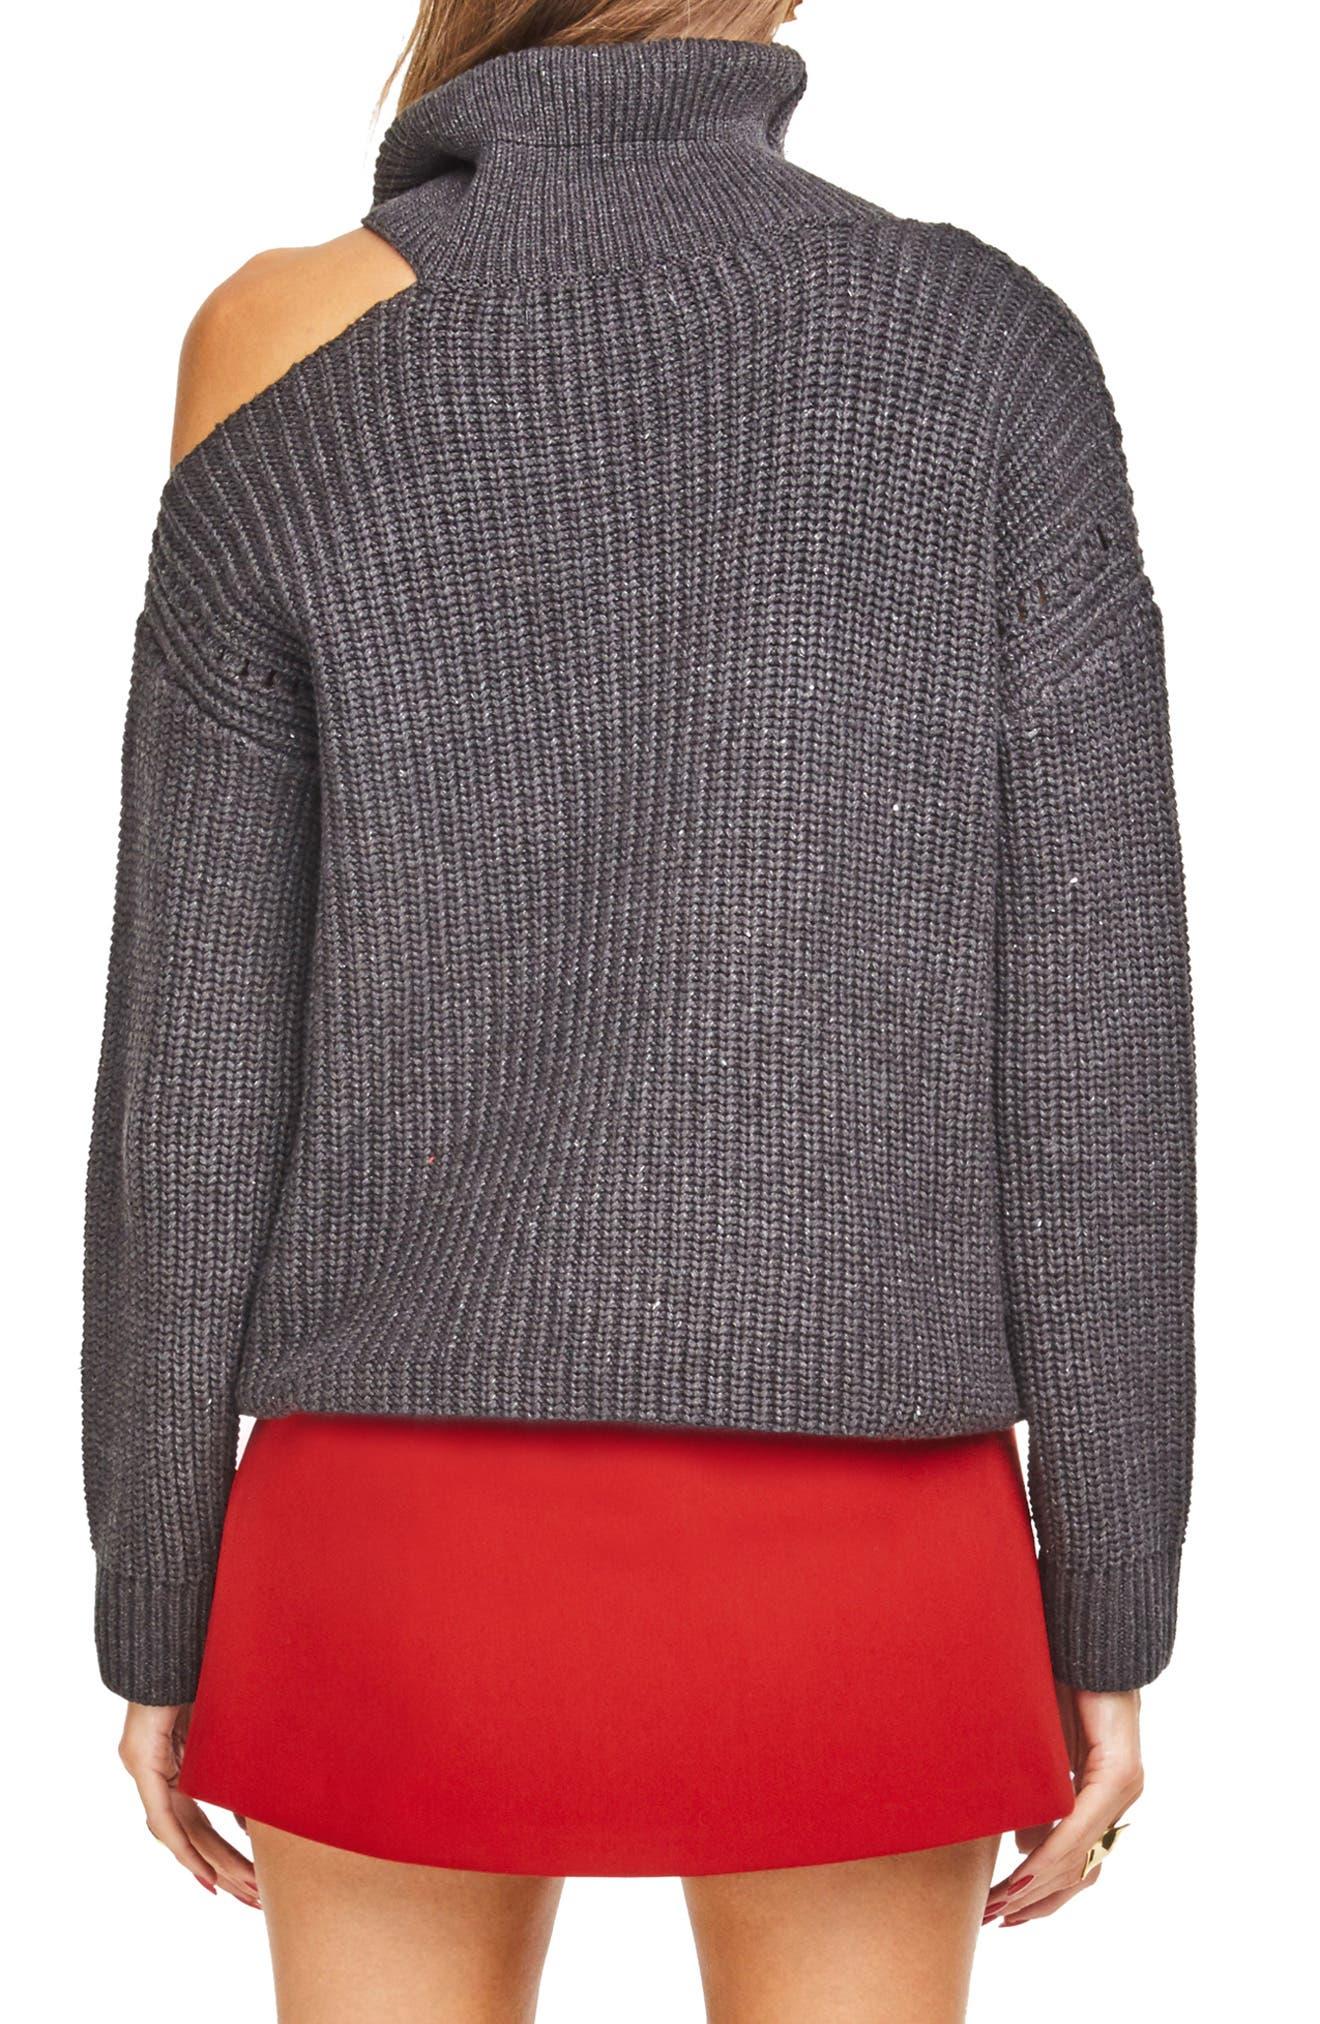 Sepulveda Sweater,                             Alternate thumbnail 2, color,                             020